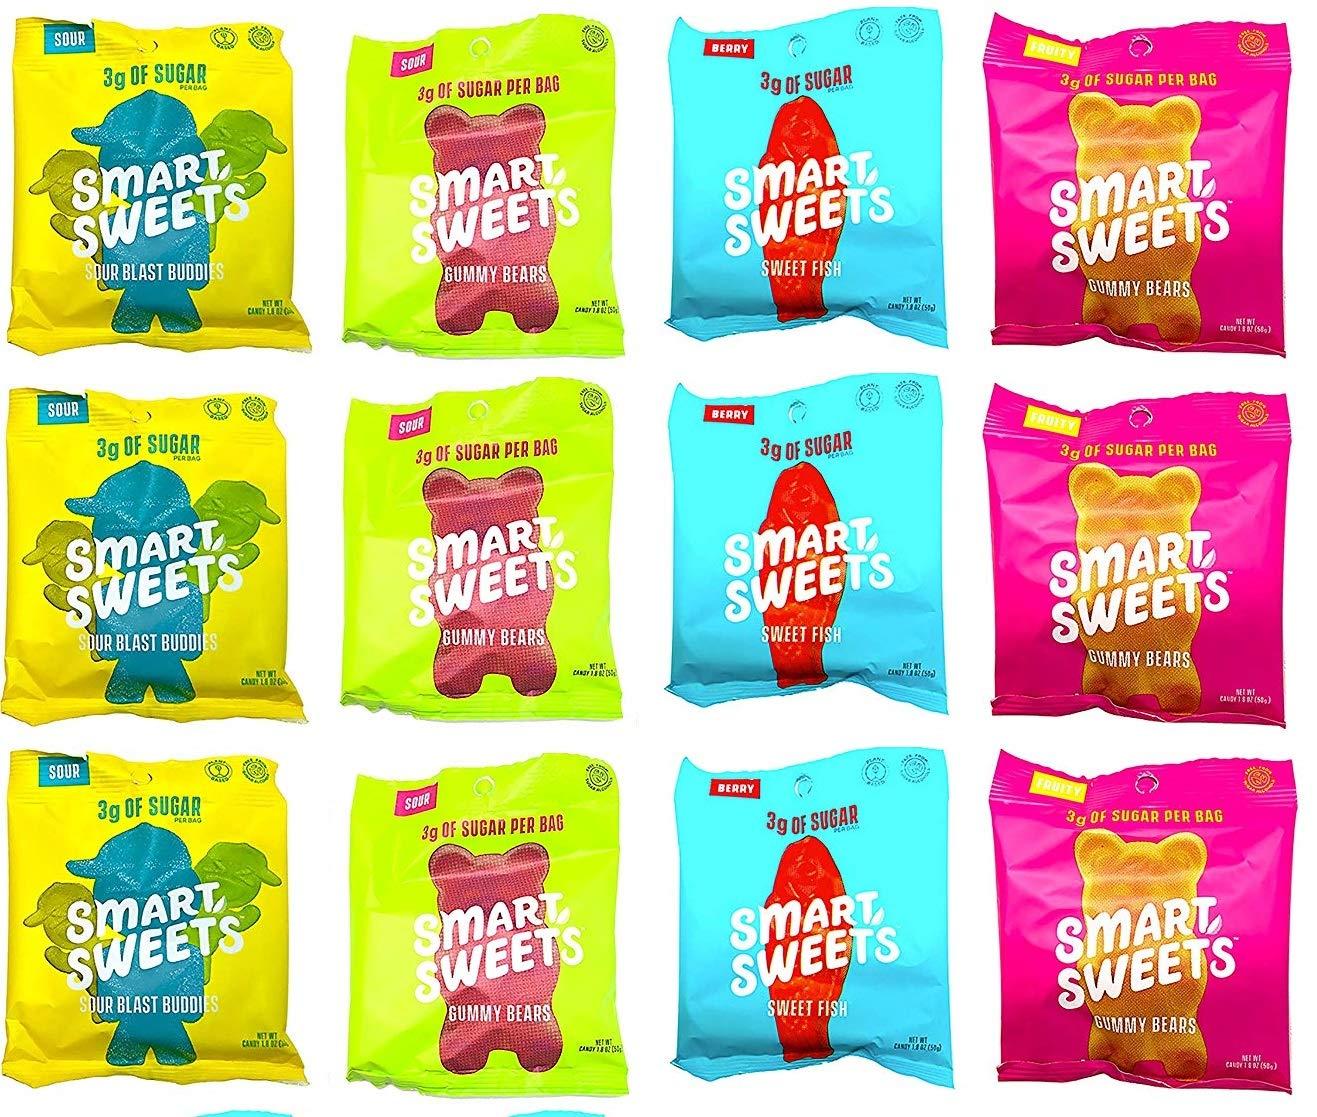 12 Pack Variety Keto-Friendly Gummy Bears - Stevia Sweetened Fruity Gummy Bears, Sour Gummy Bears, Sweet Fish, Sour Buddies, Low Sugar, Low Carbs (1.8 Ounce)